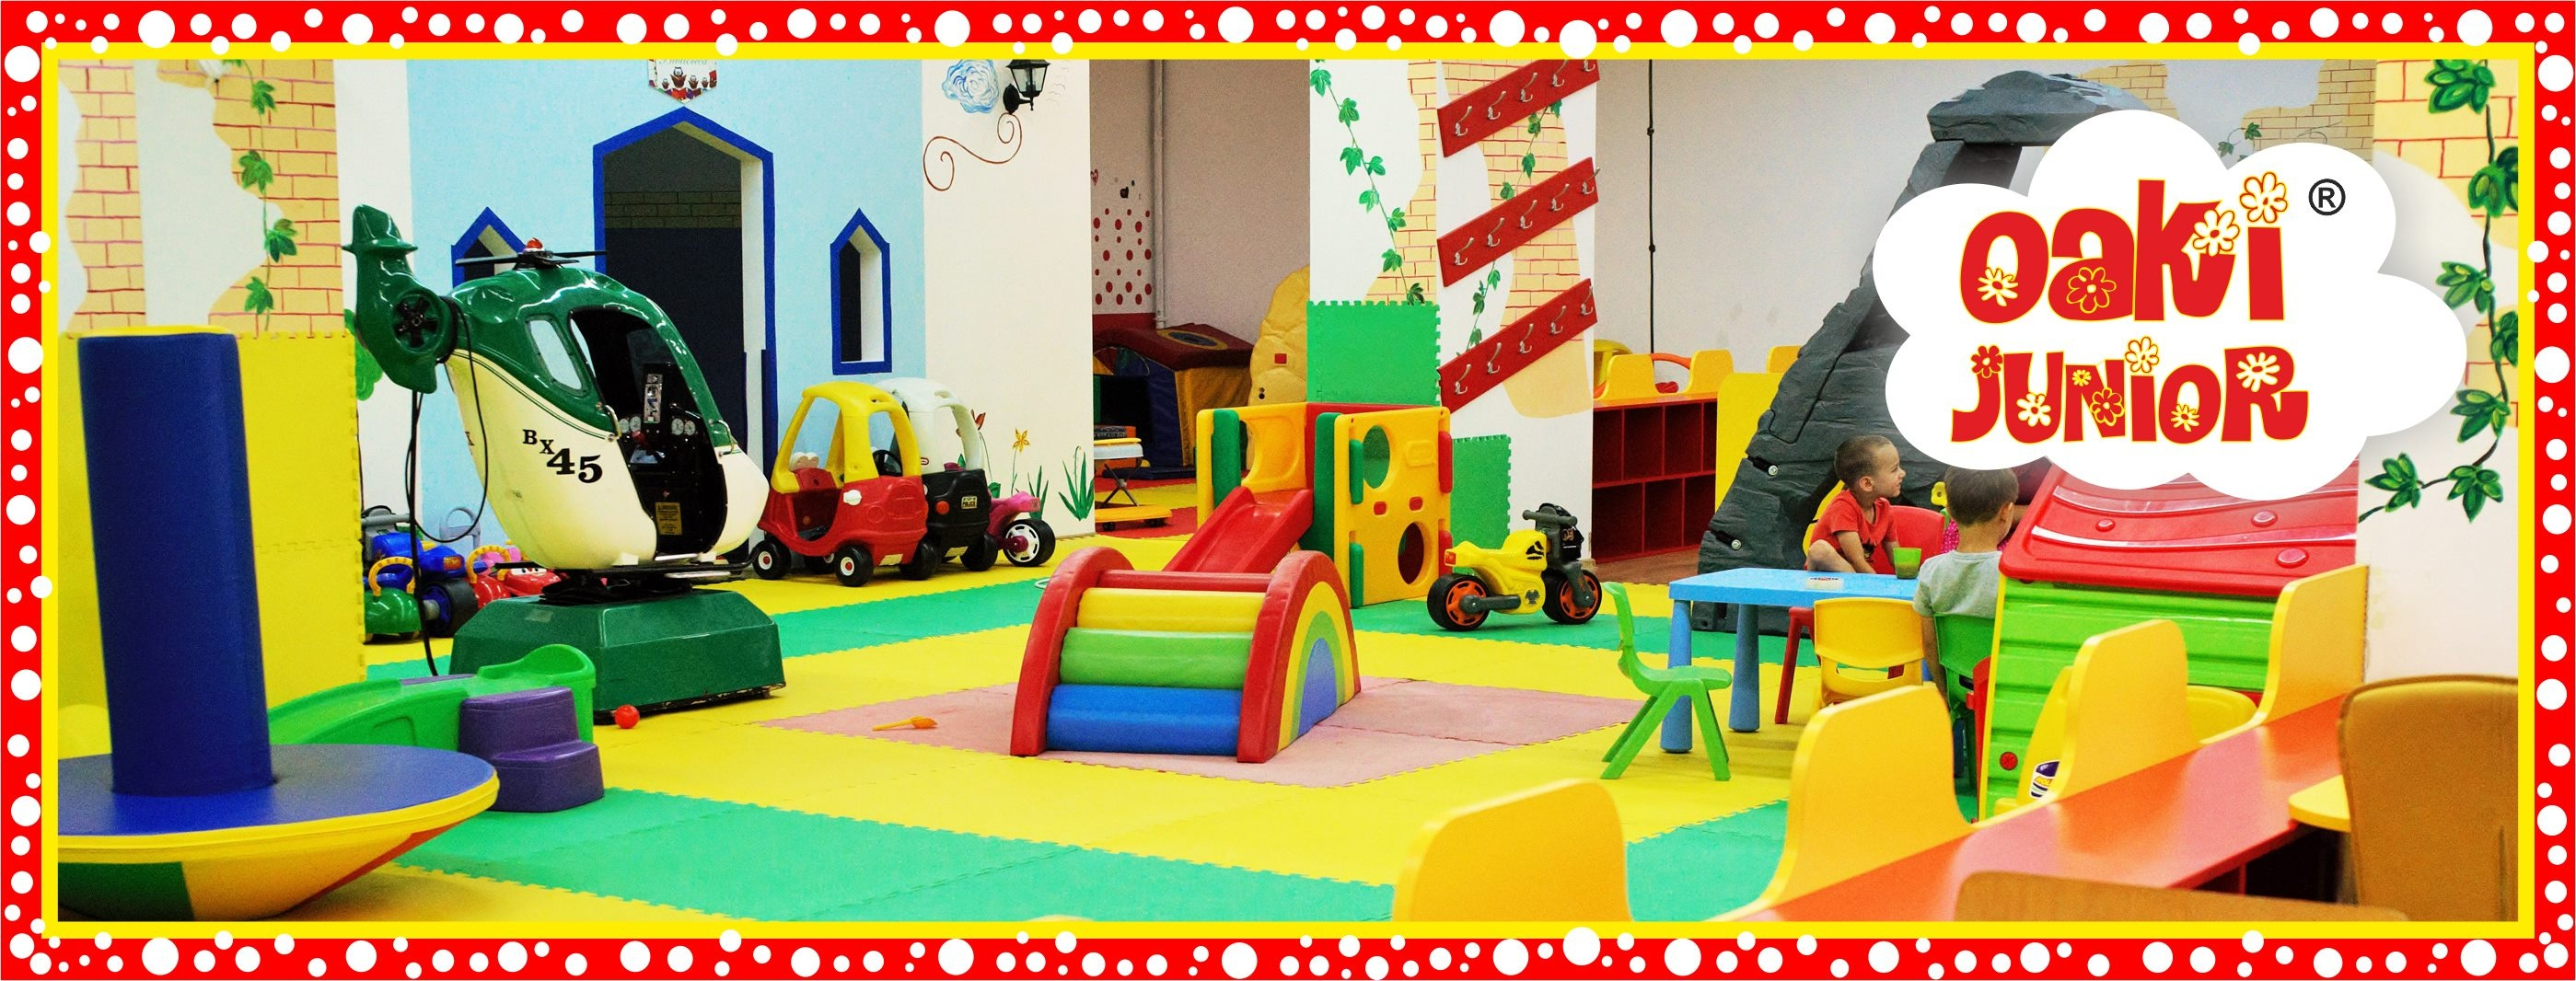 loc de joaca copii brasov